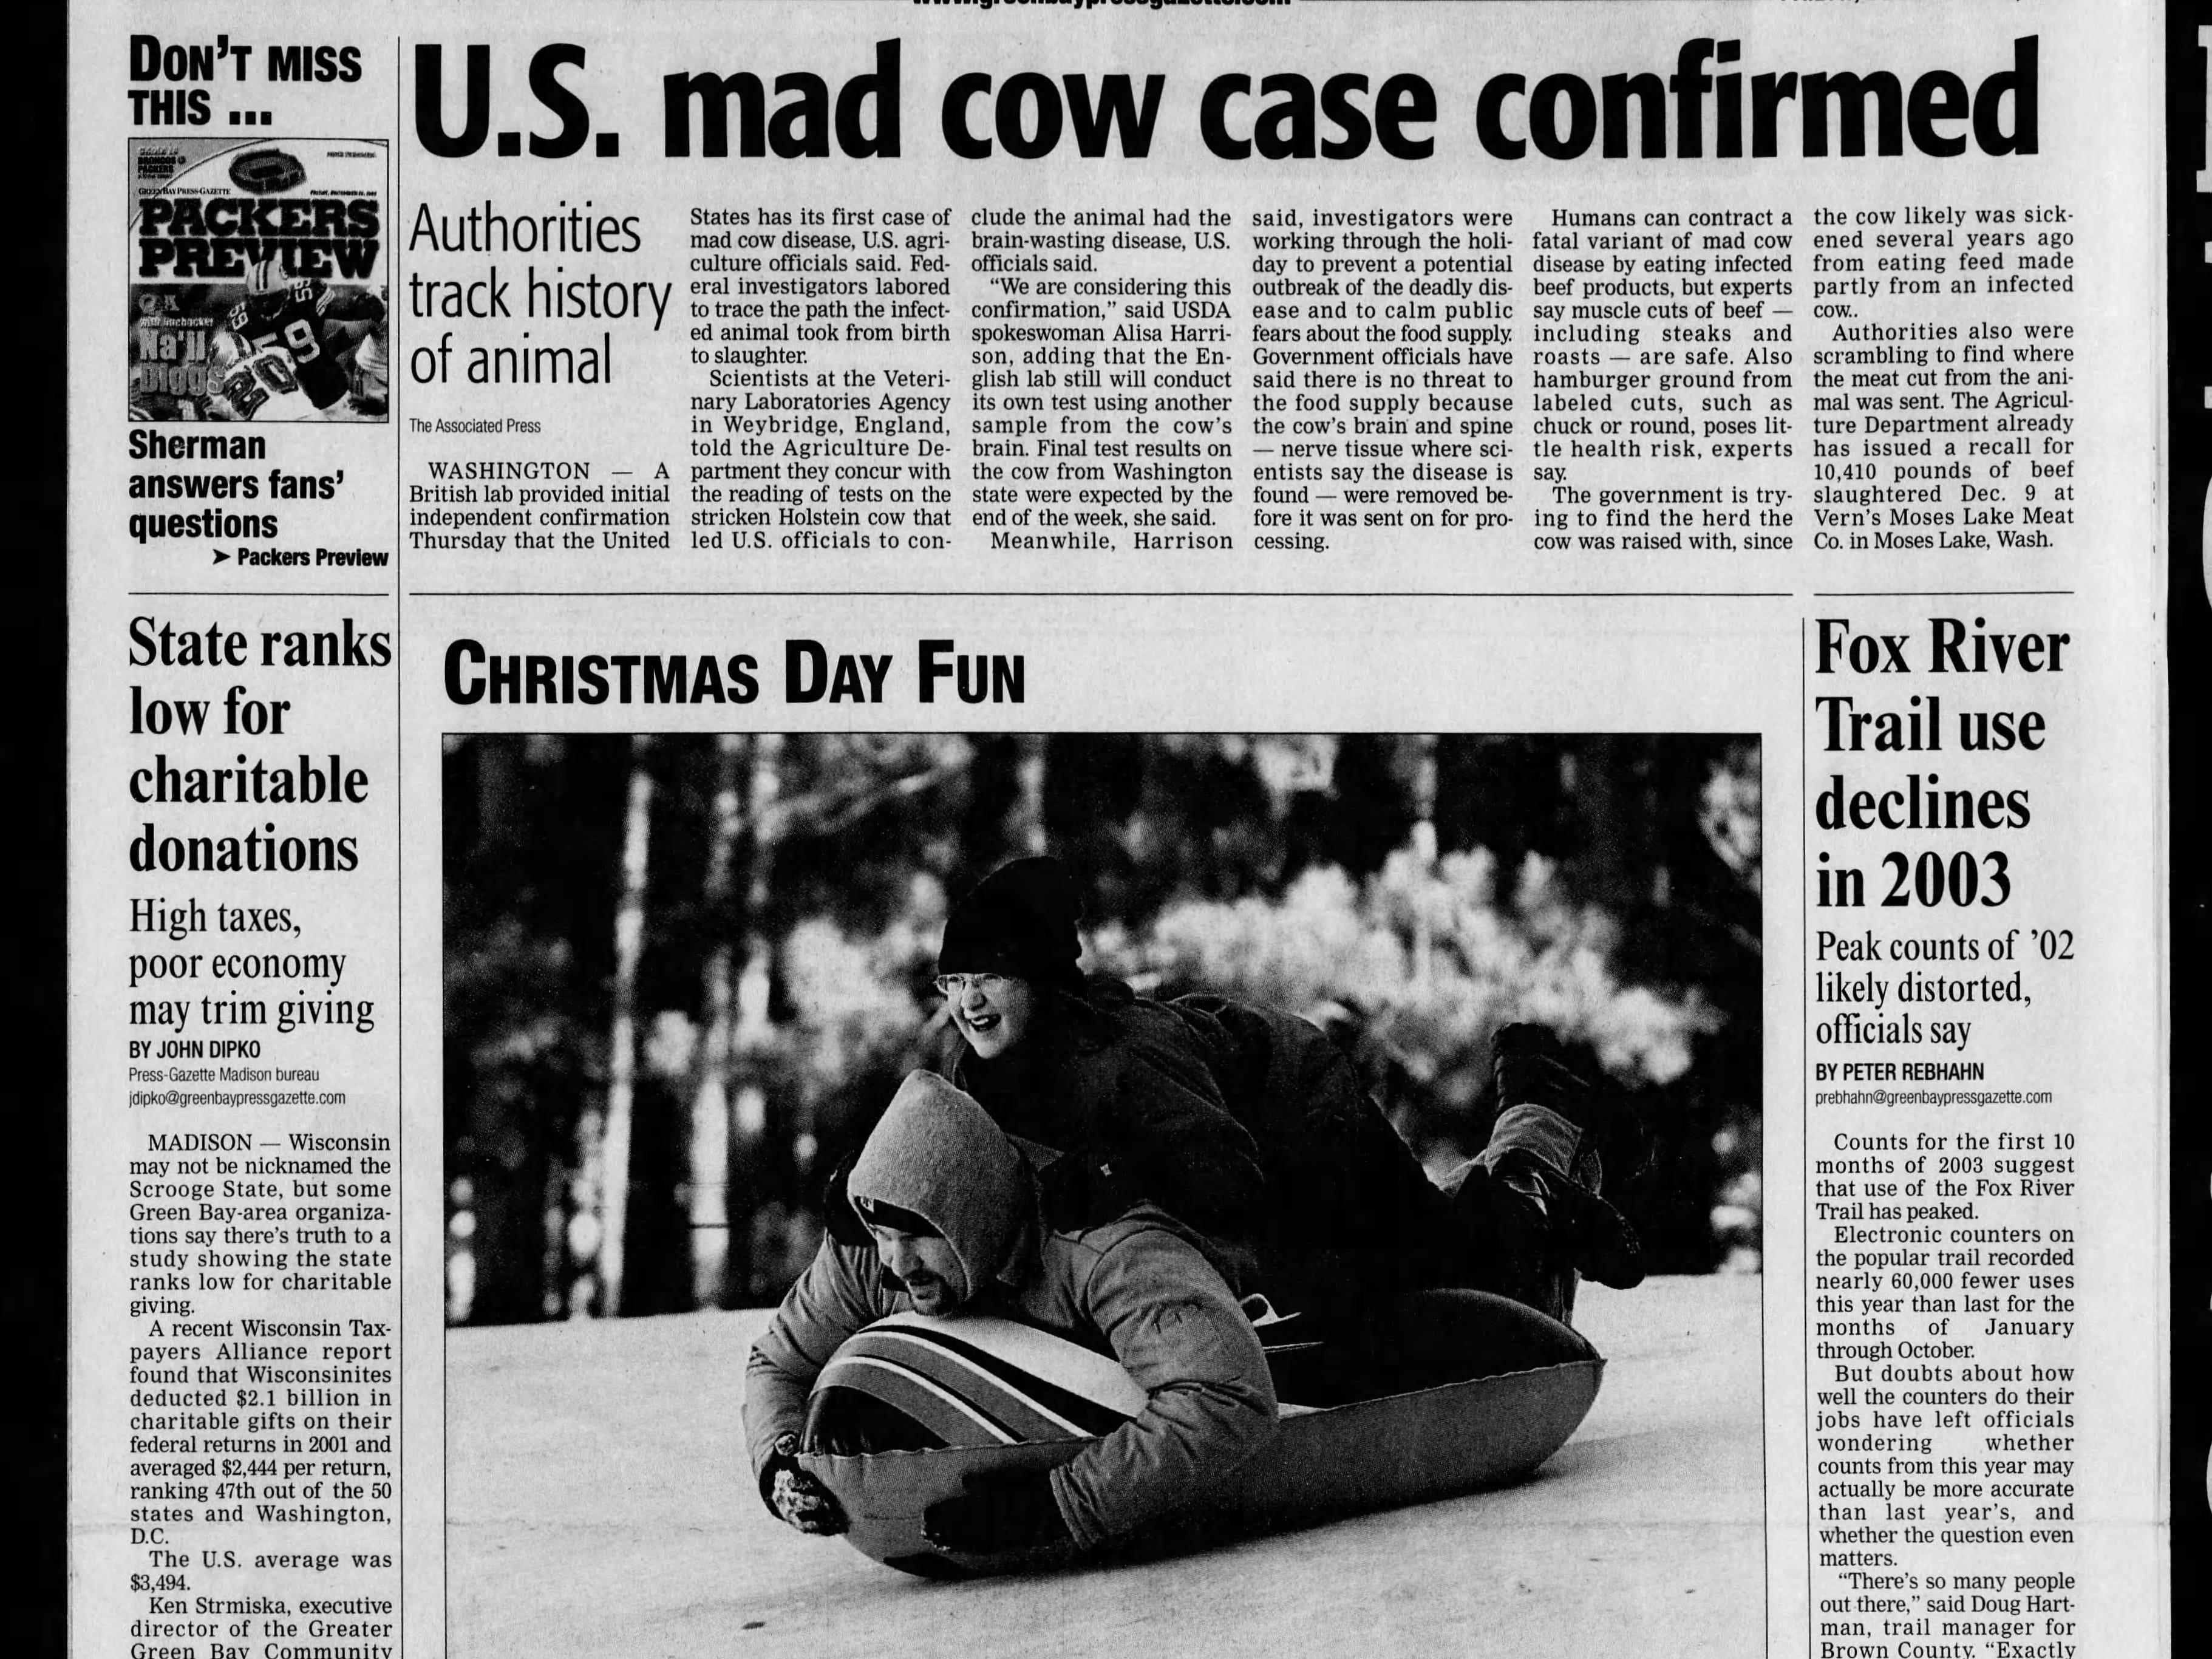 Dec. 26, 2003